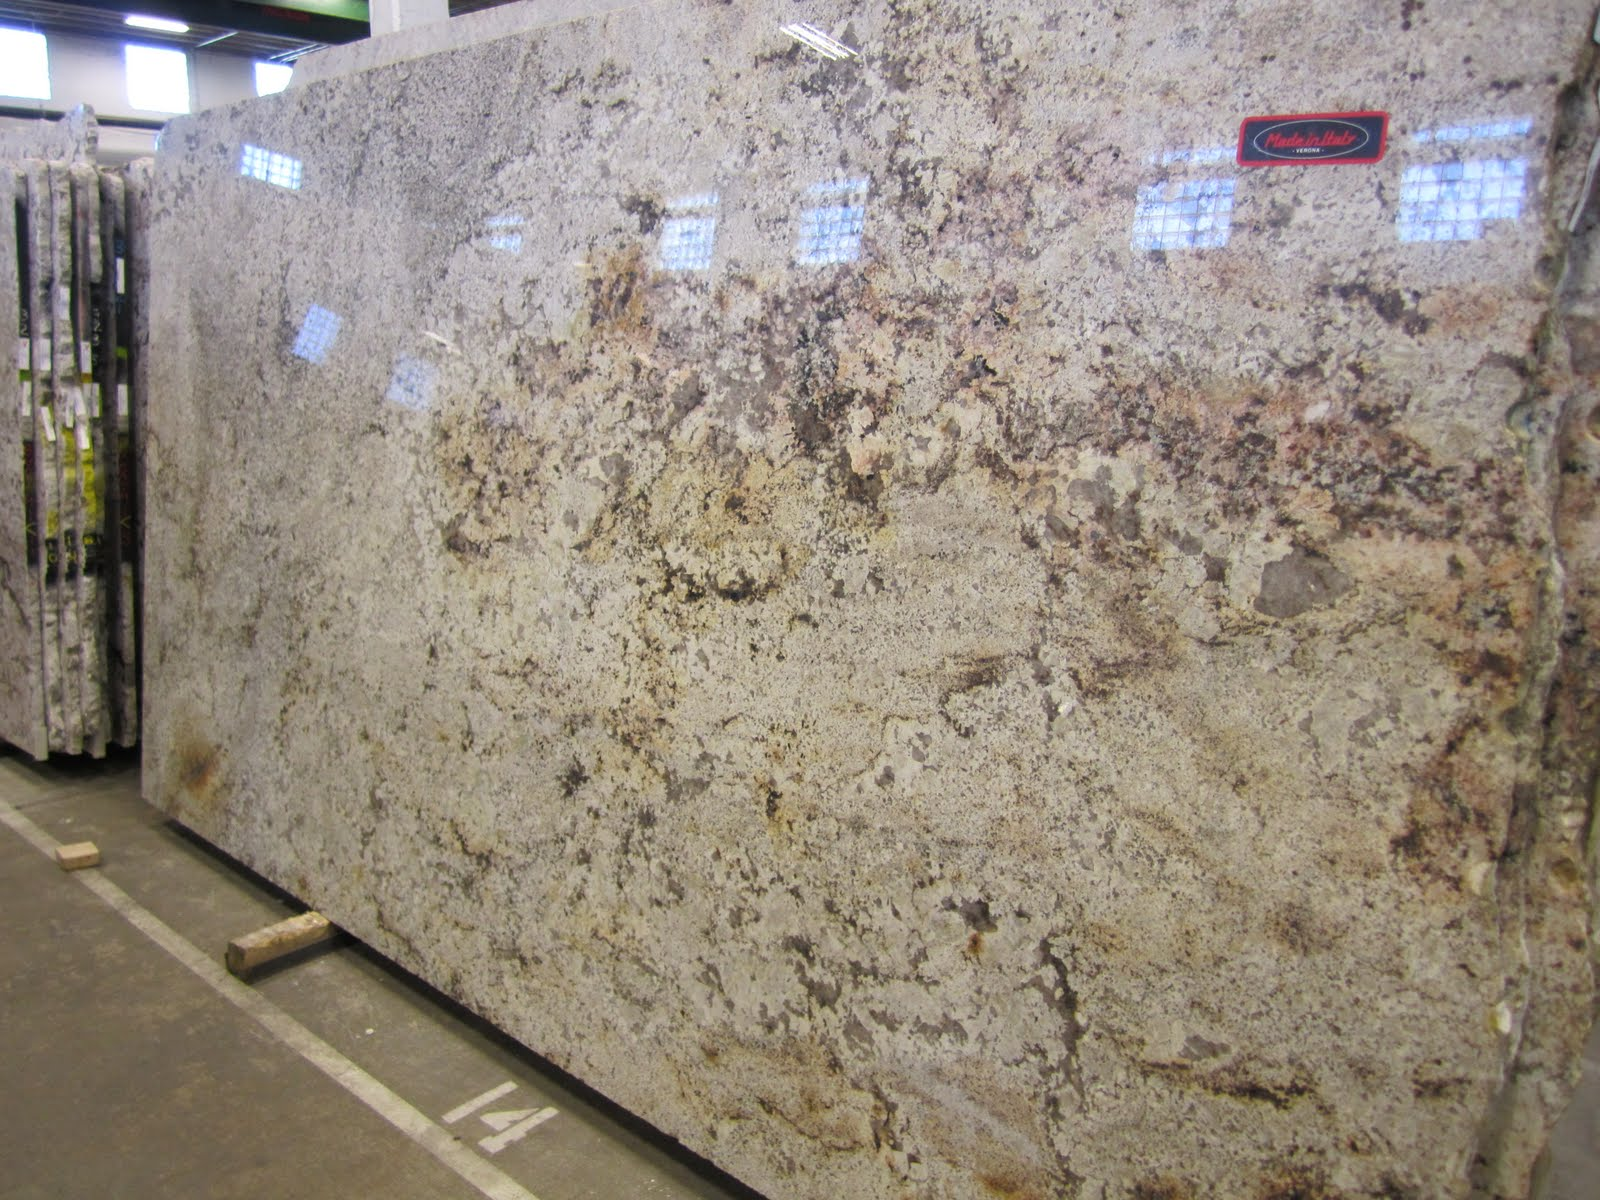 USC granite: Sage Brush 128 x 69, 117 x 69, 127 x 70